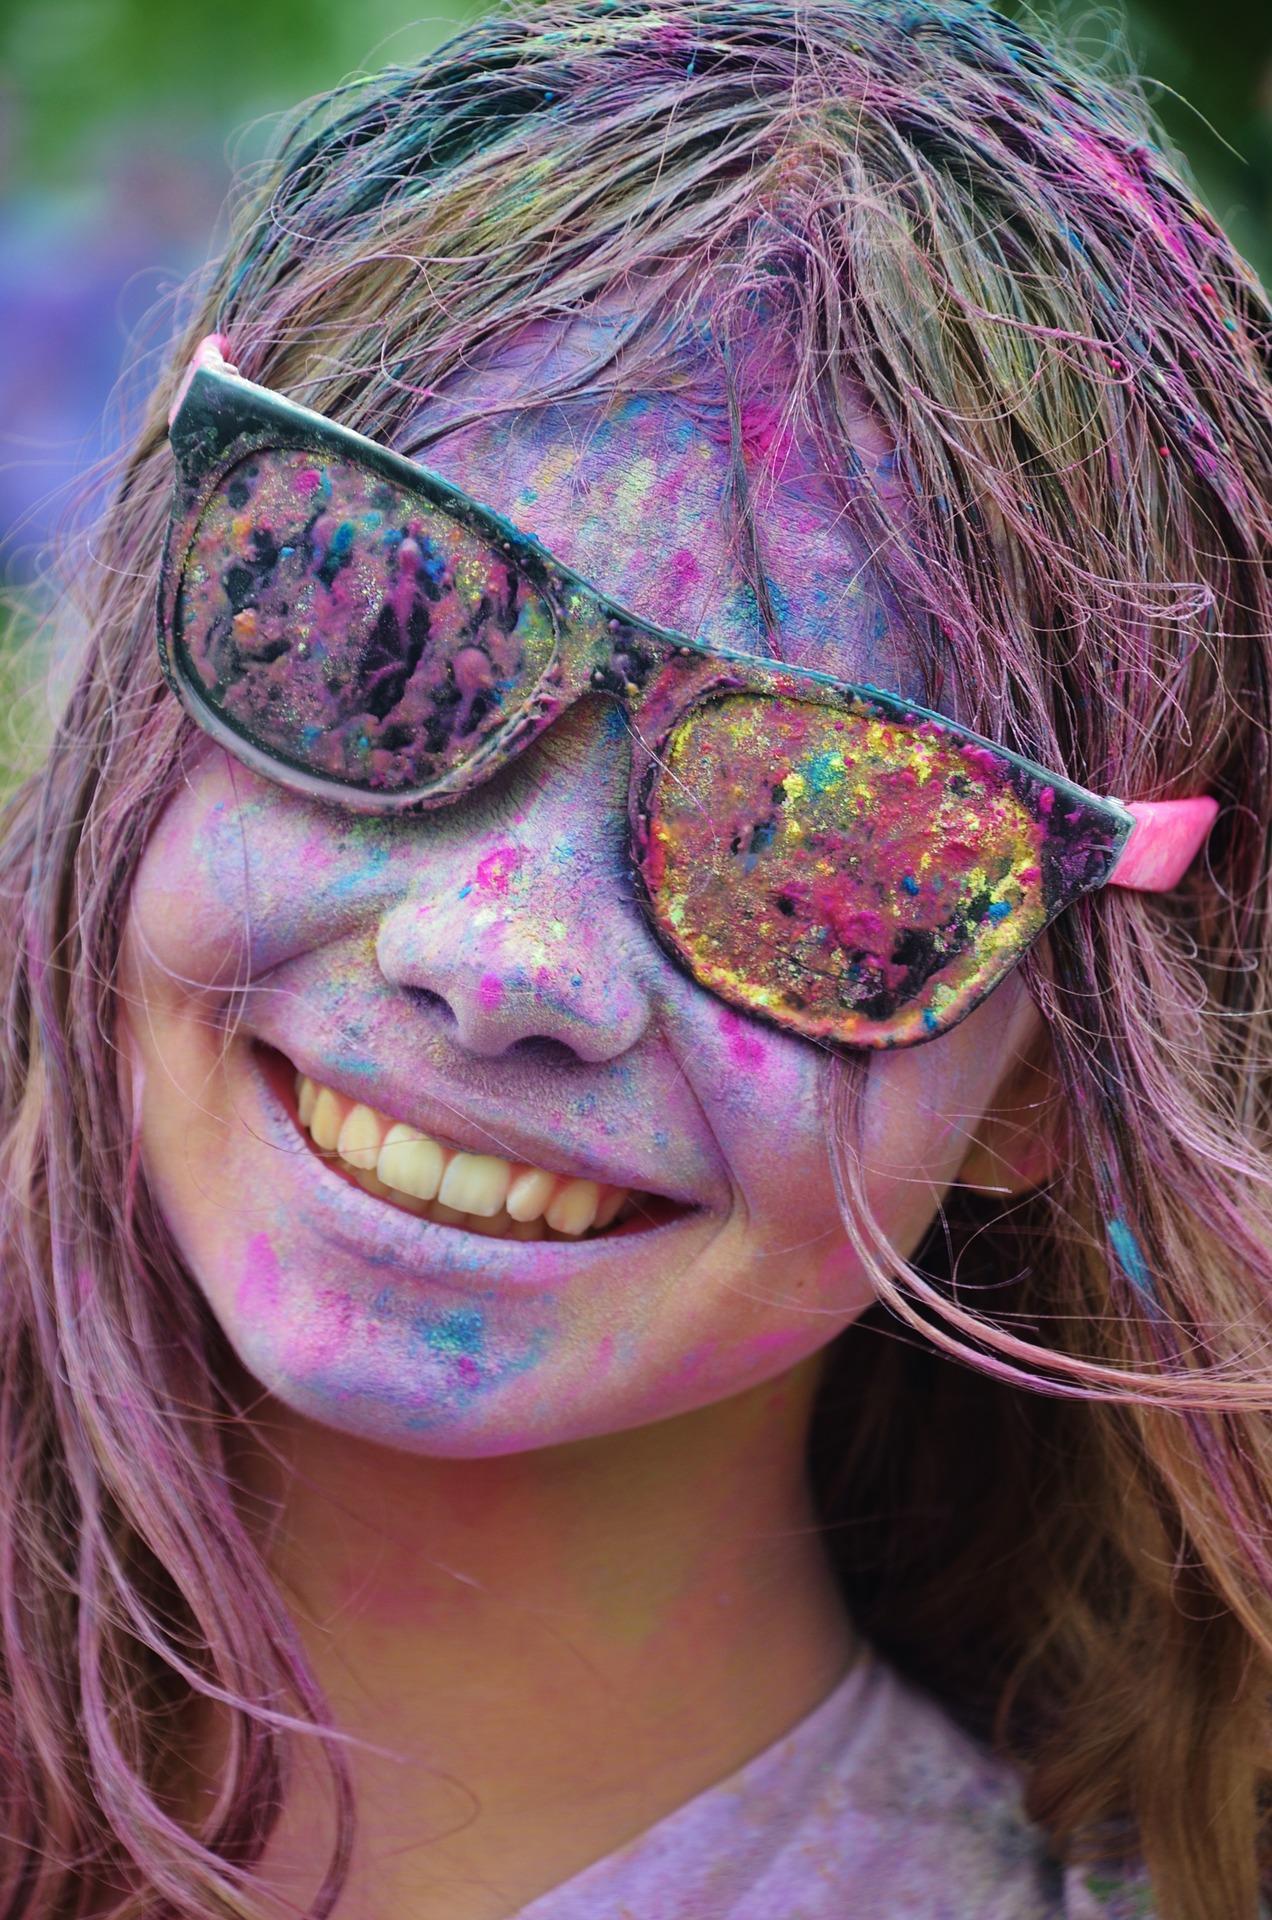 painted girl sunglasses